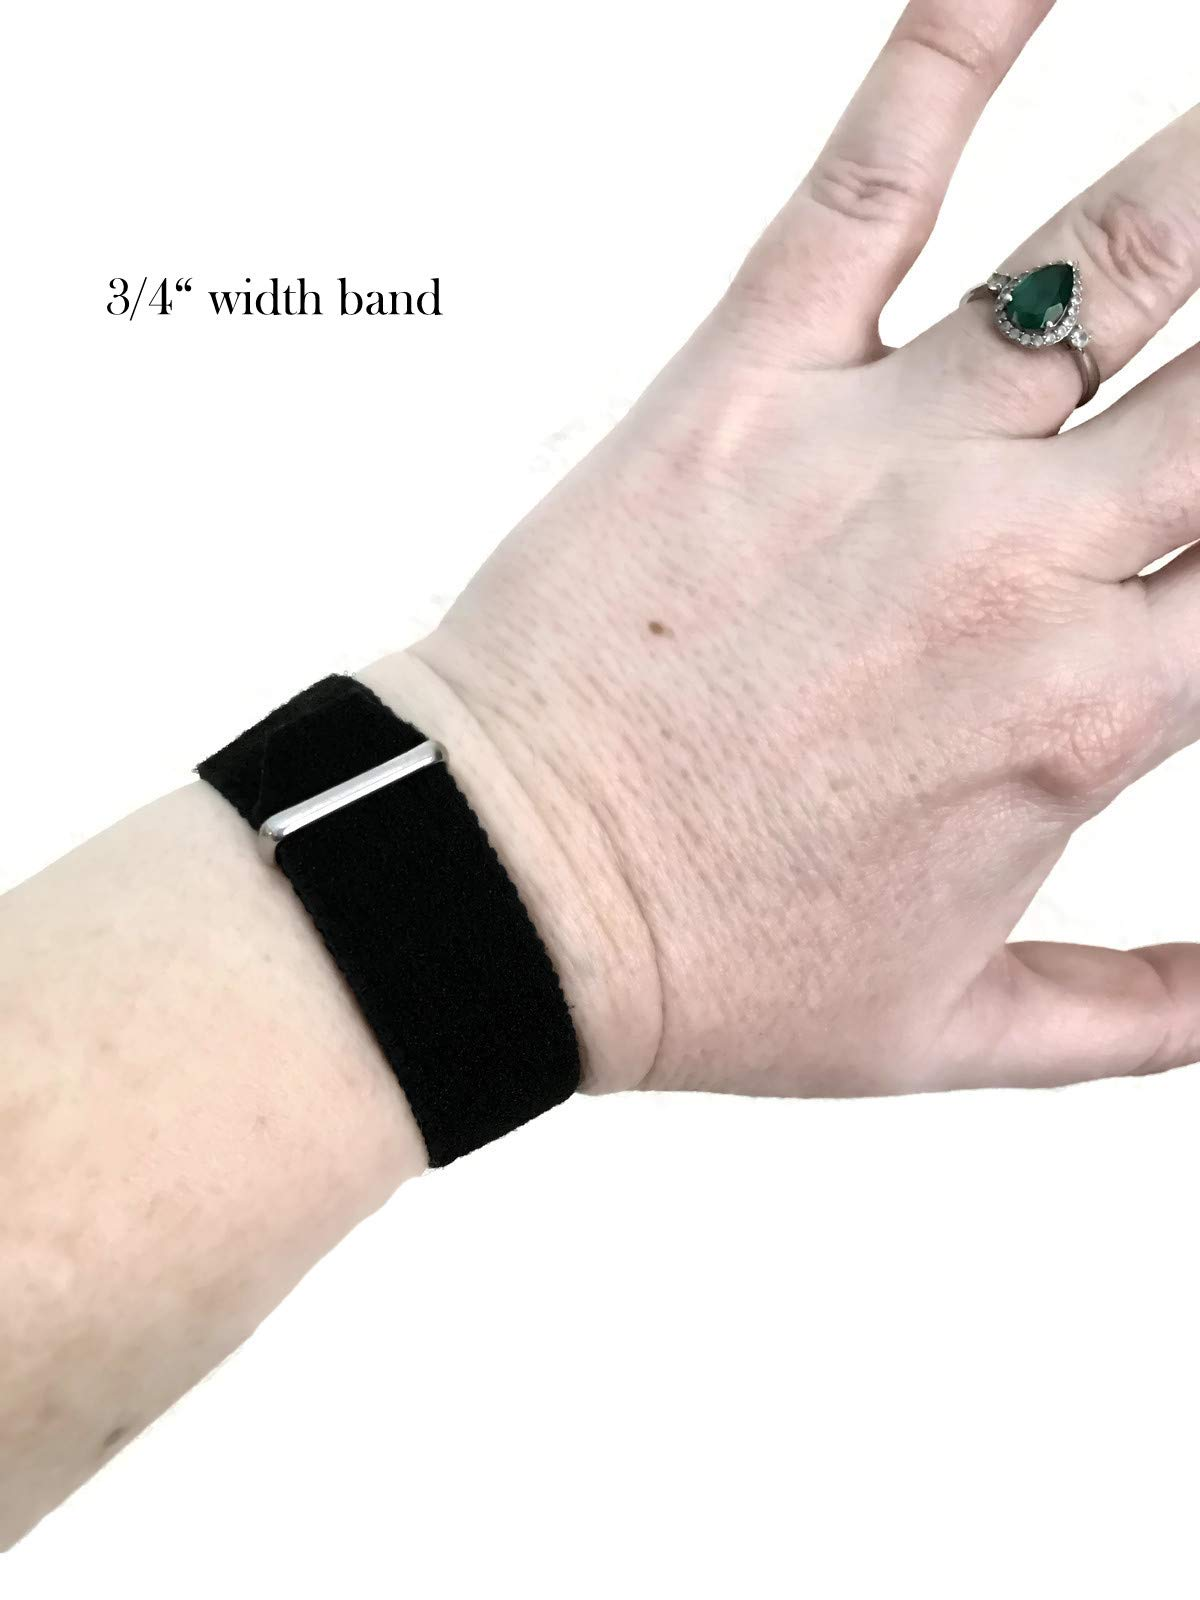 Acupressure Motion Sickness Wristband – Adjustable Hook/Loop Closure Nausea Bracelet for Morning Sickness, Vertigo, and Nausea Relief – Natural Healing Adjustable Bands (Pair) Blue Dream